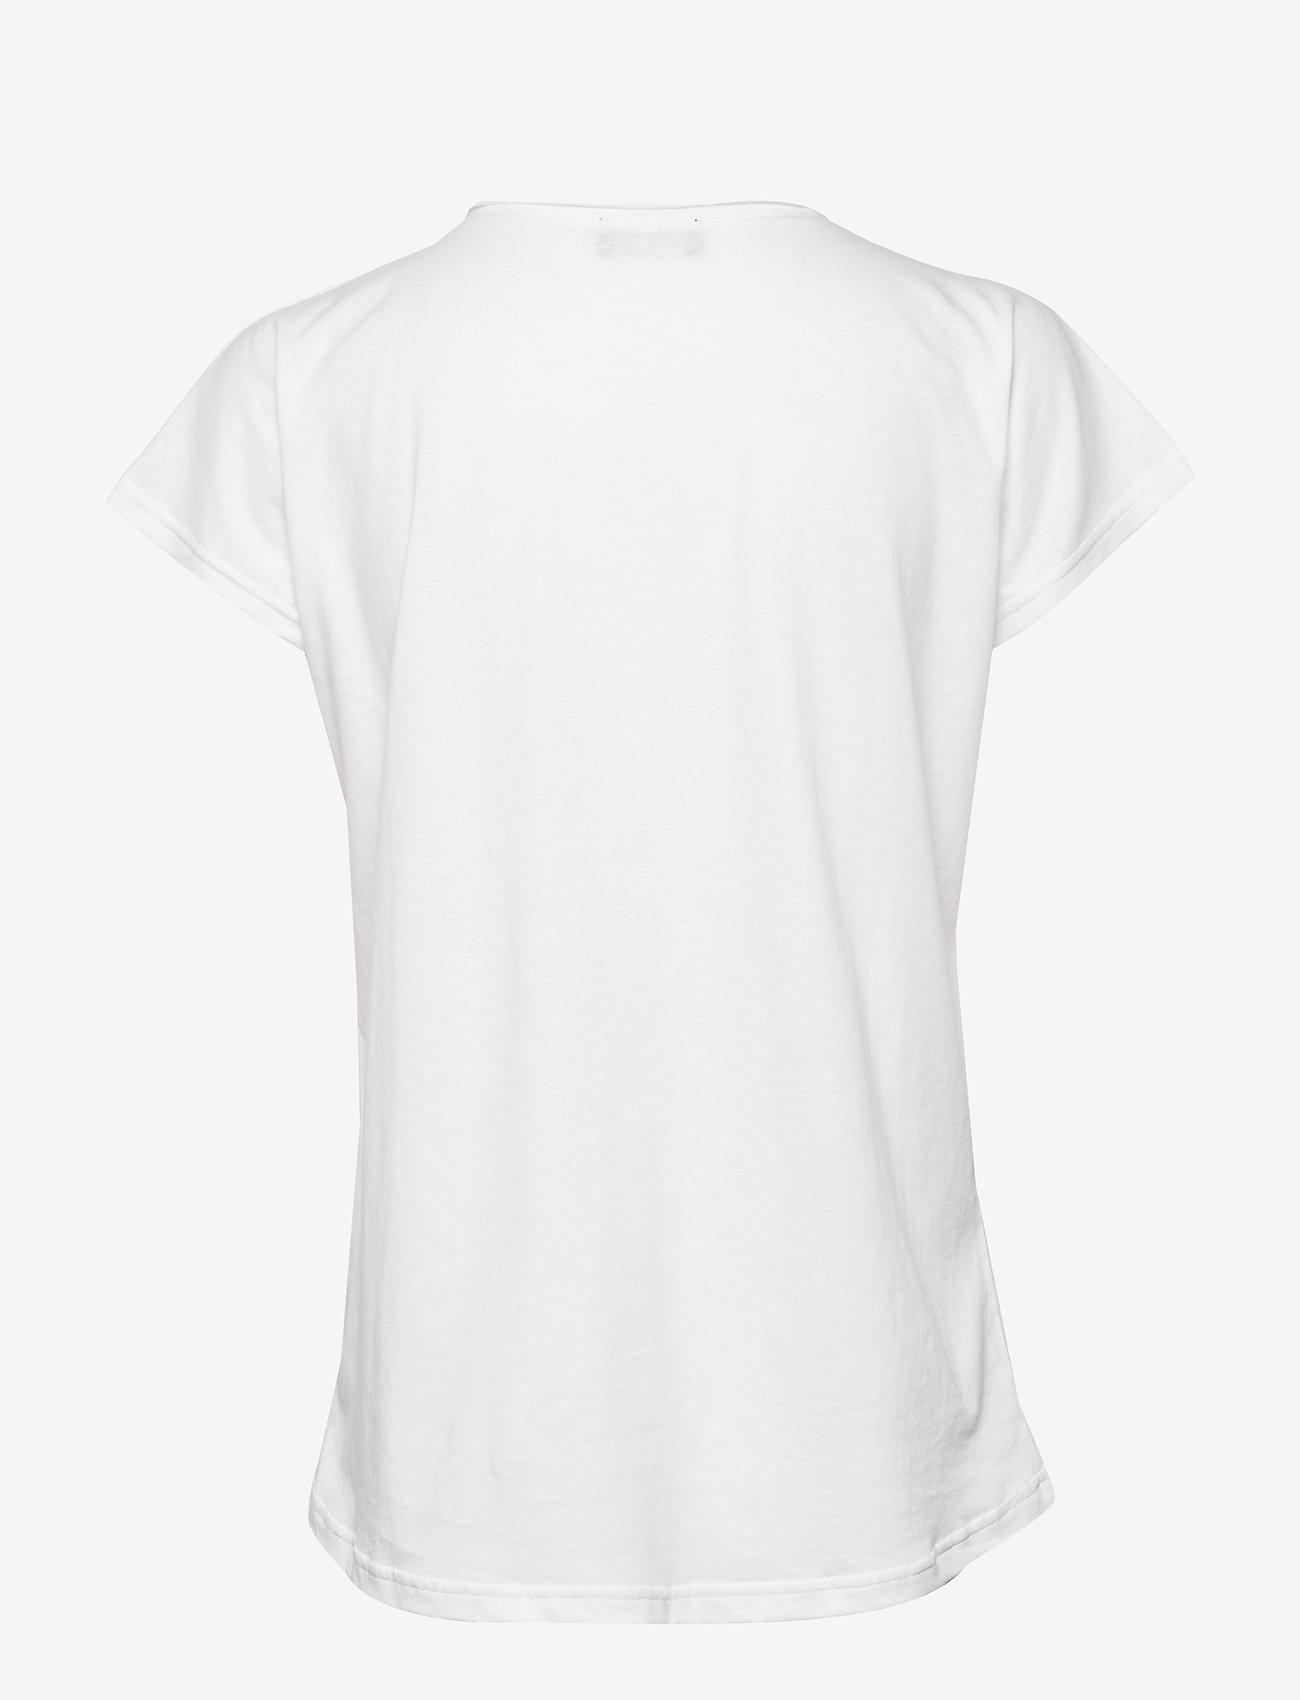 SAND - 4017 - Abella - t-shirts - optical white - 1